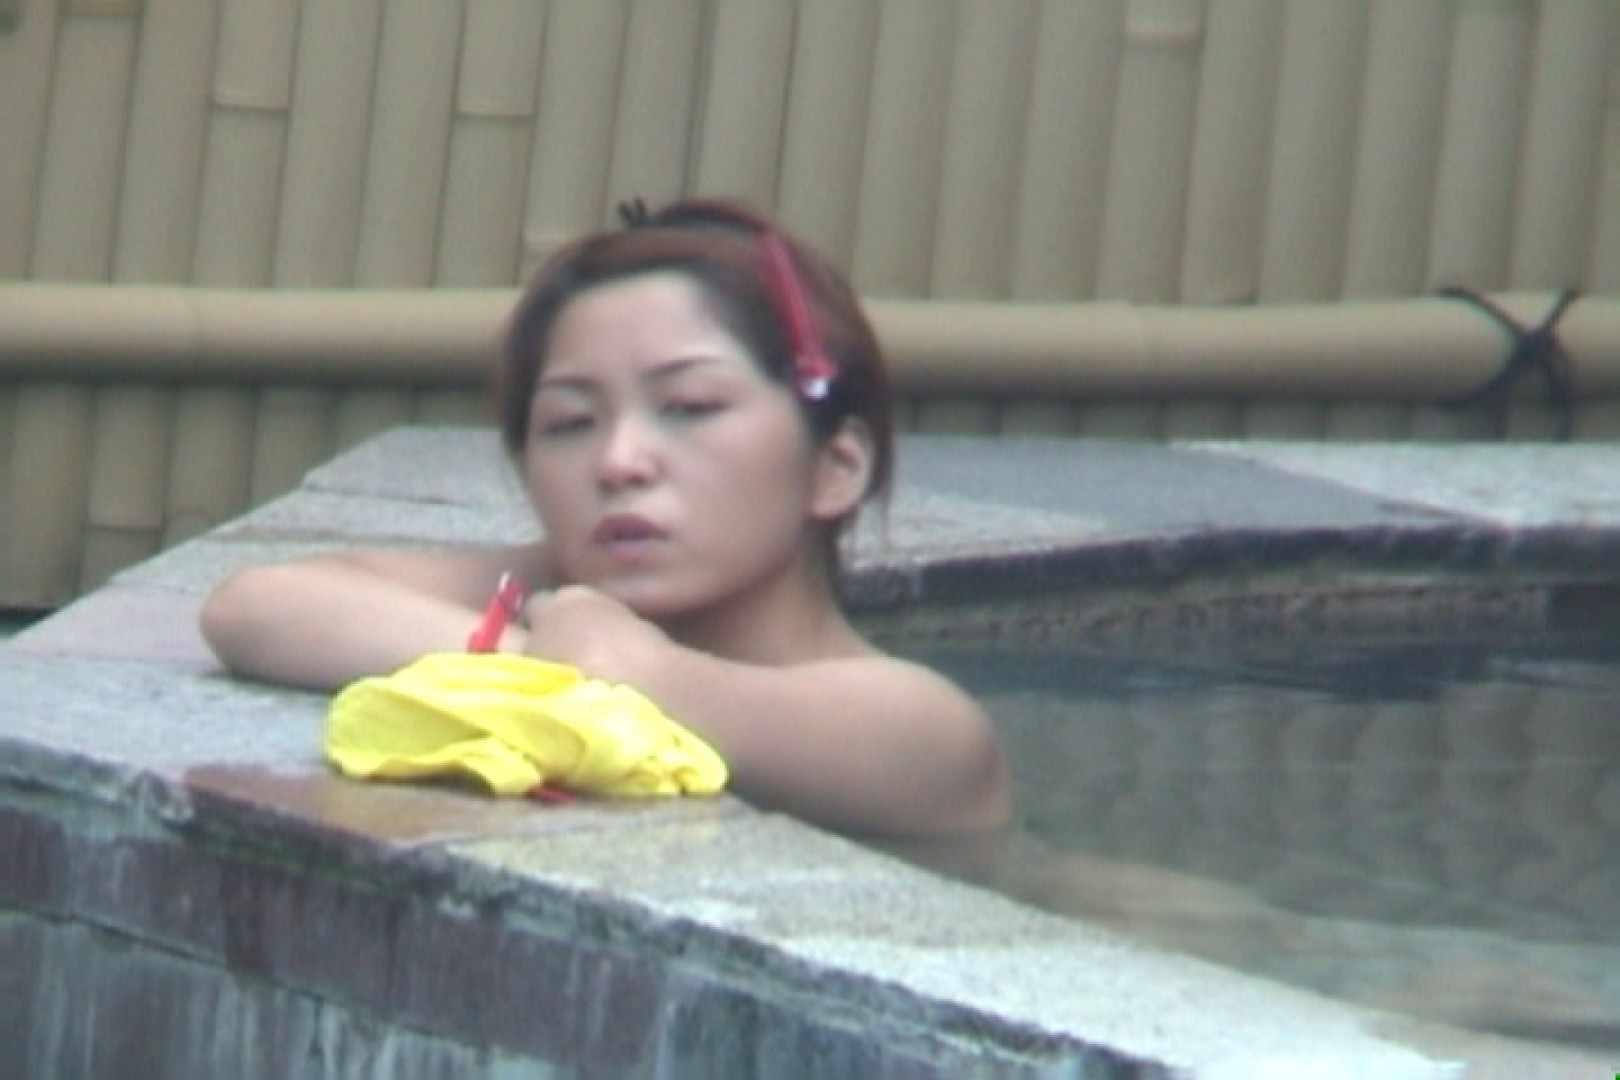 Aquaな露天風呂Vol.574 盗撮 | OLセックス  97画像 31